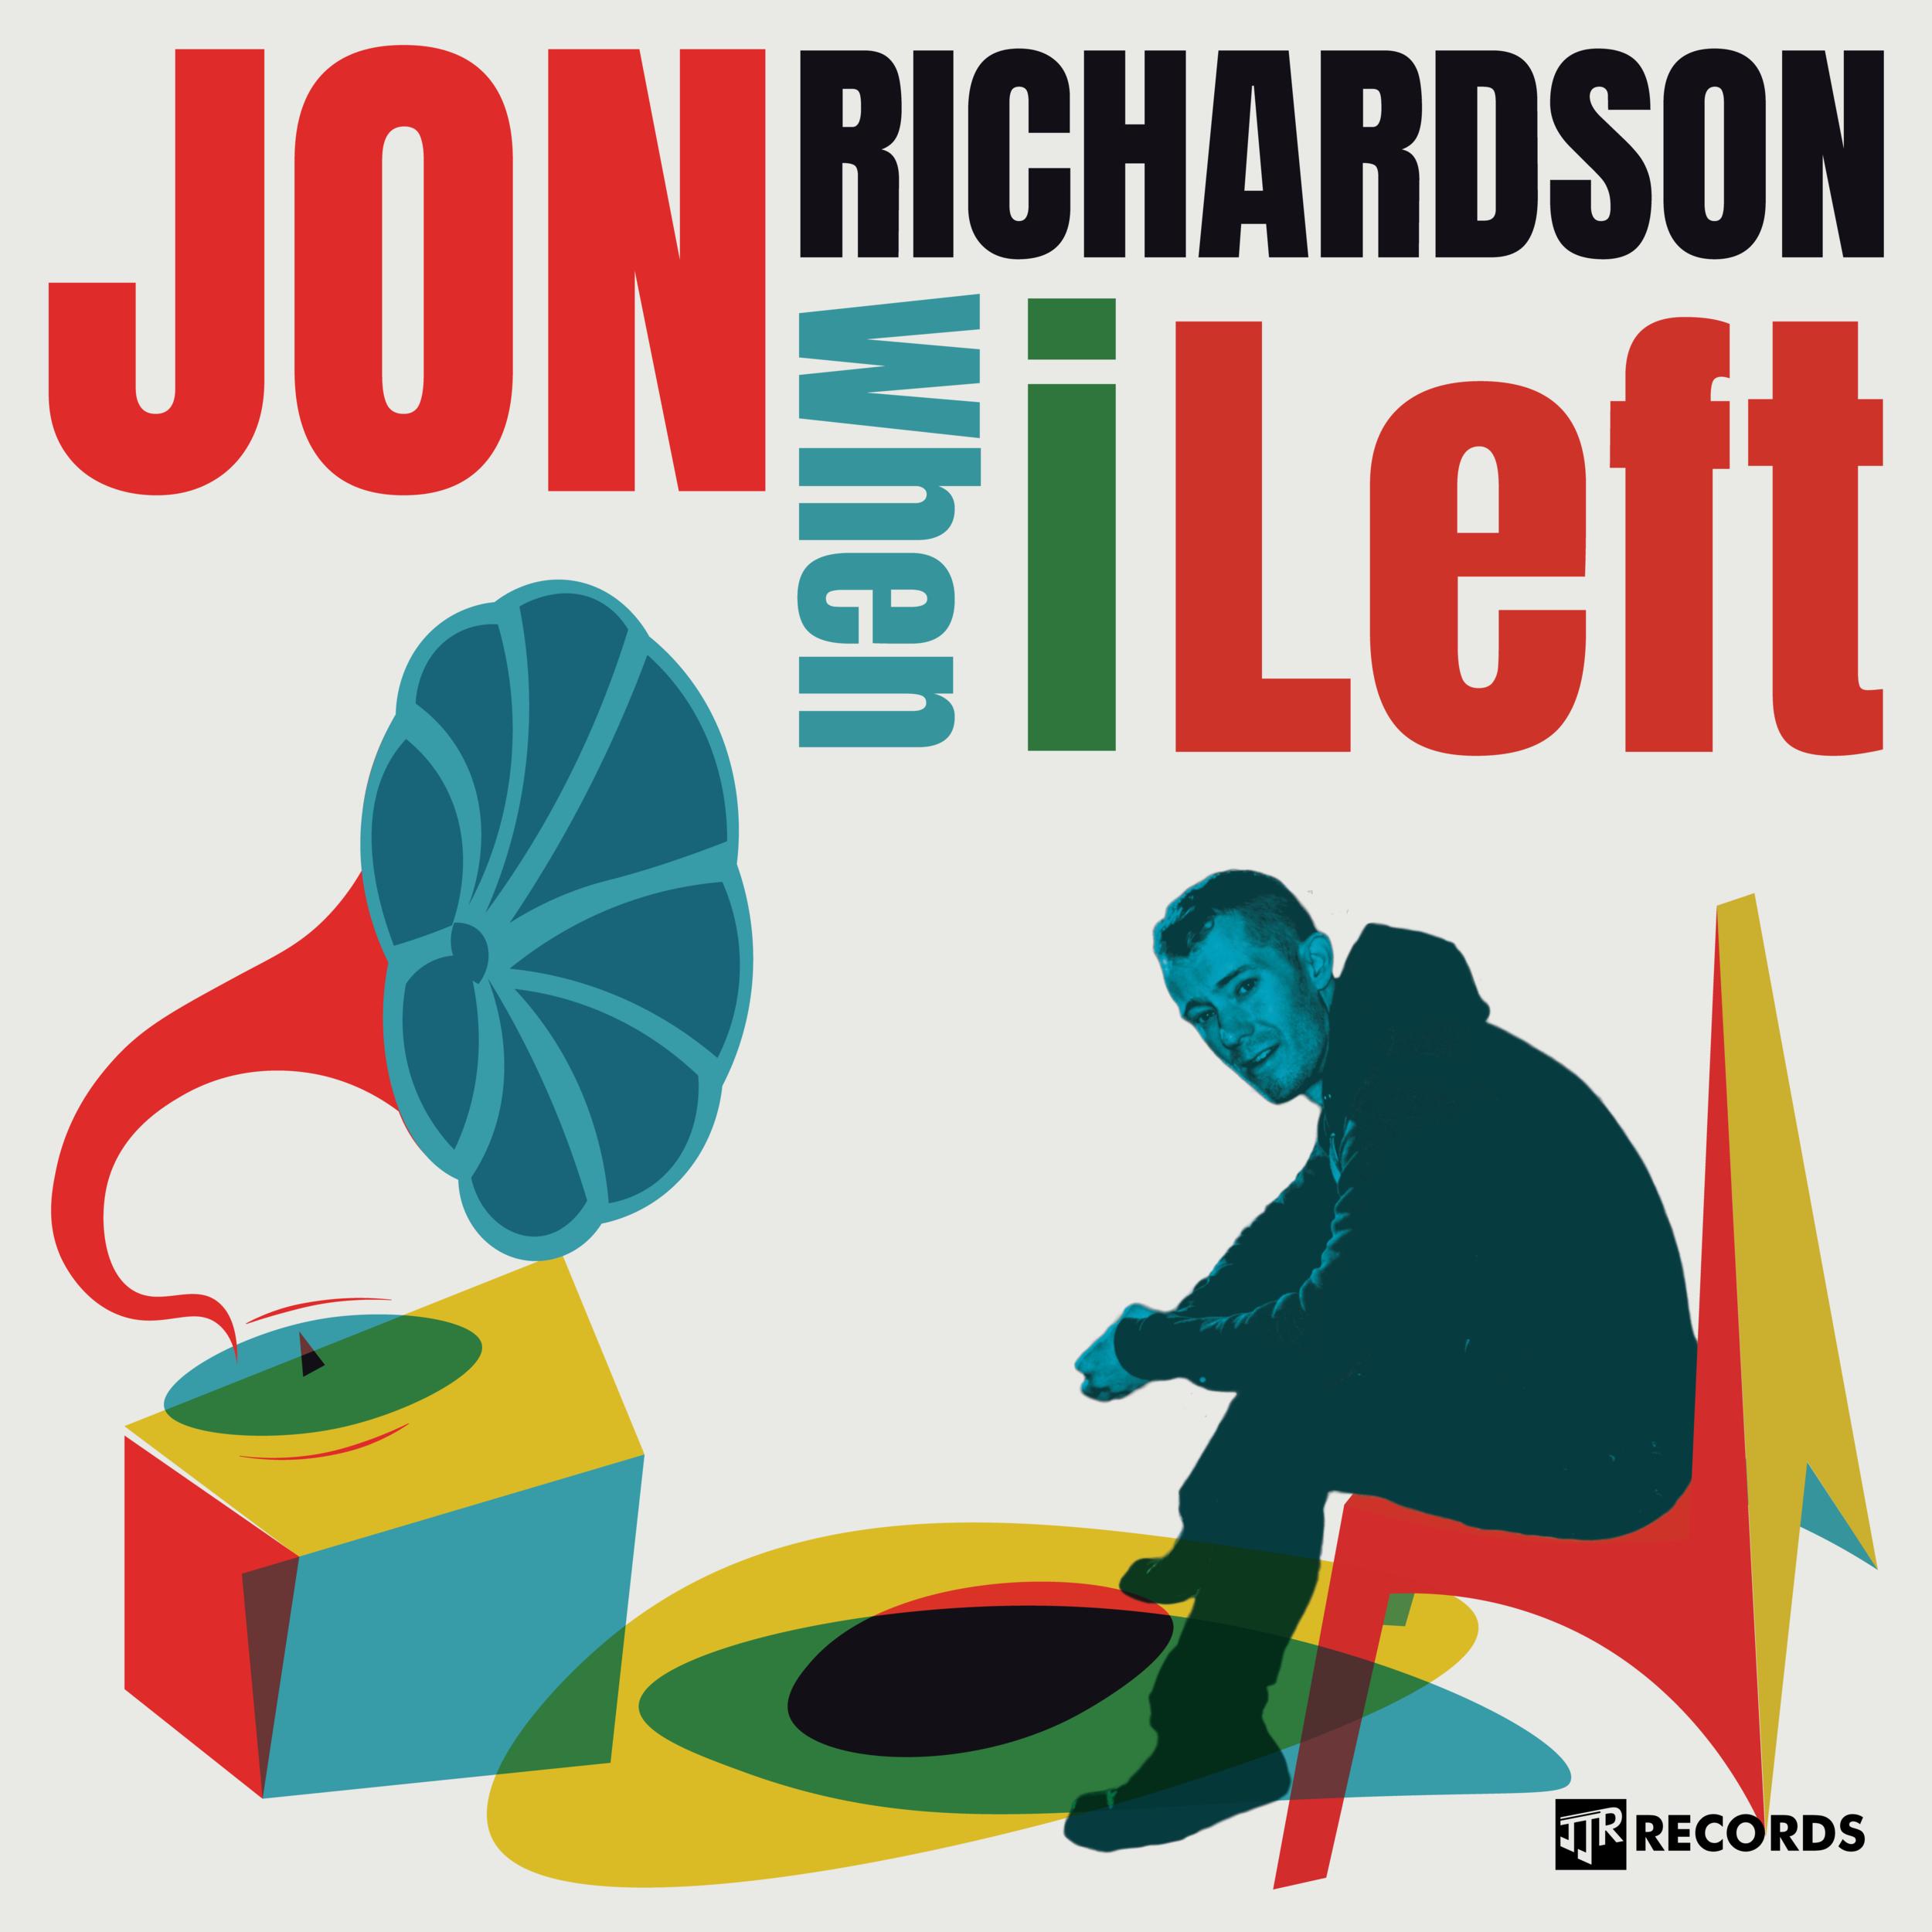 Jon Richardson's second studio album - listen today @BandCamp